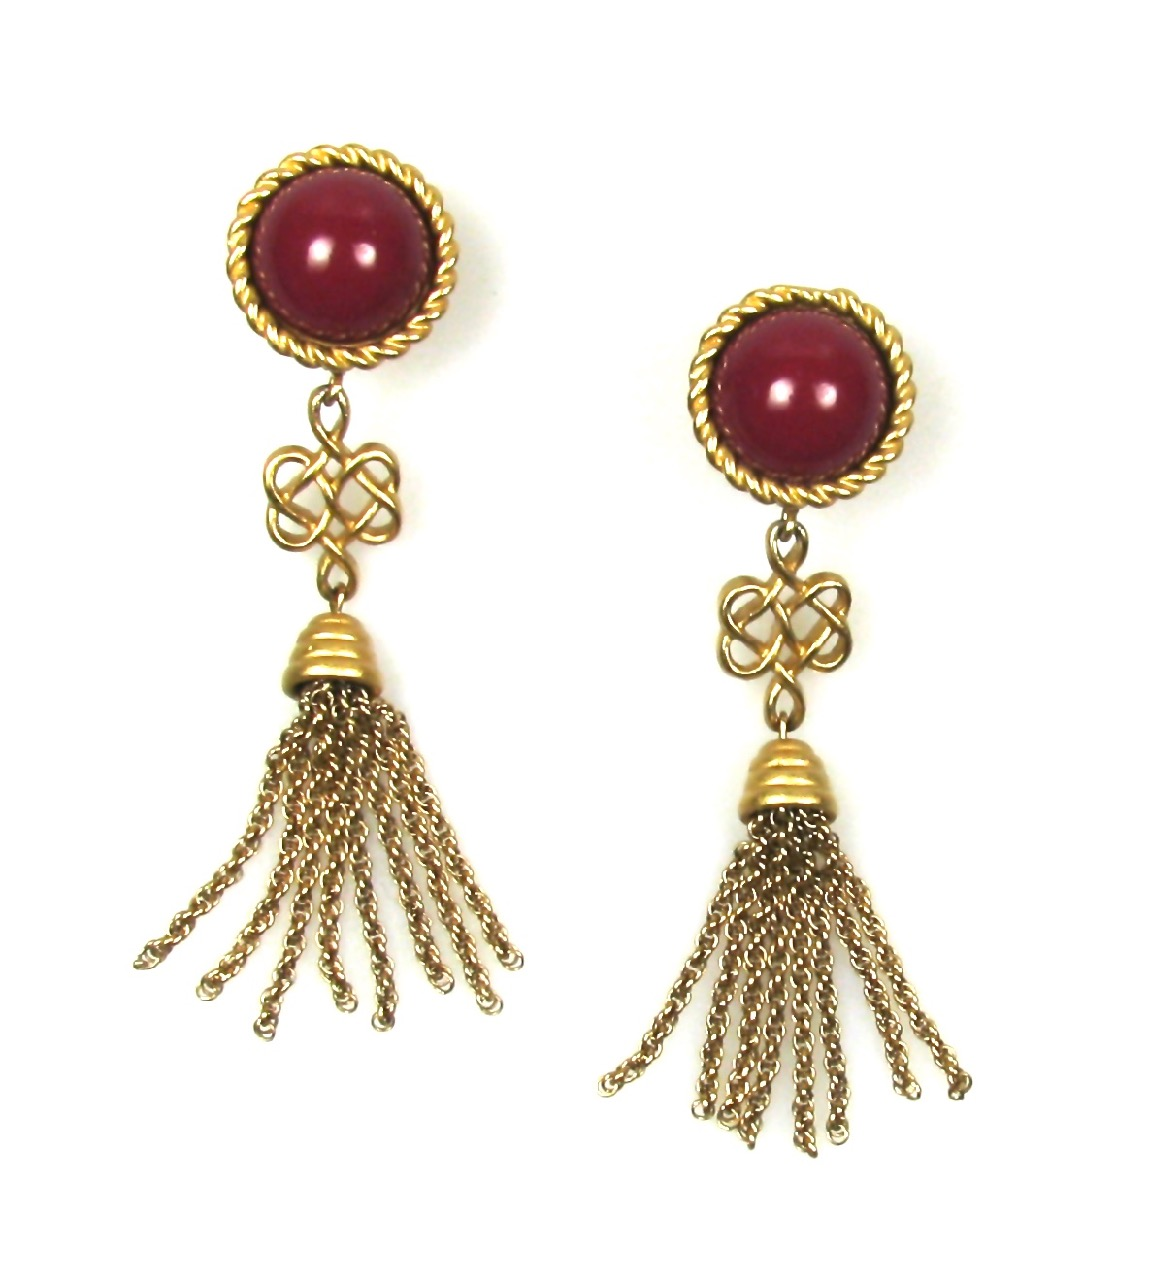 Monet Tassel Earrings 1980s